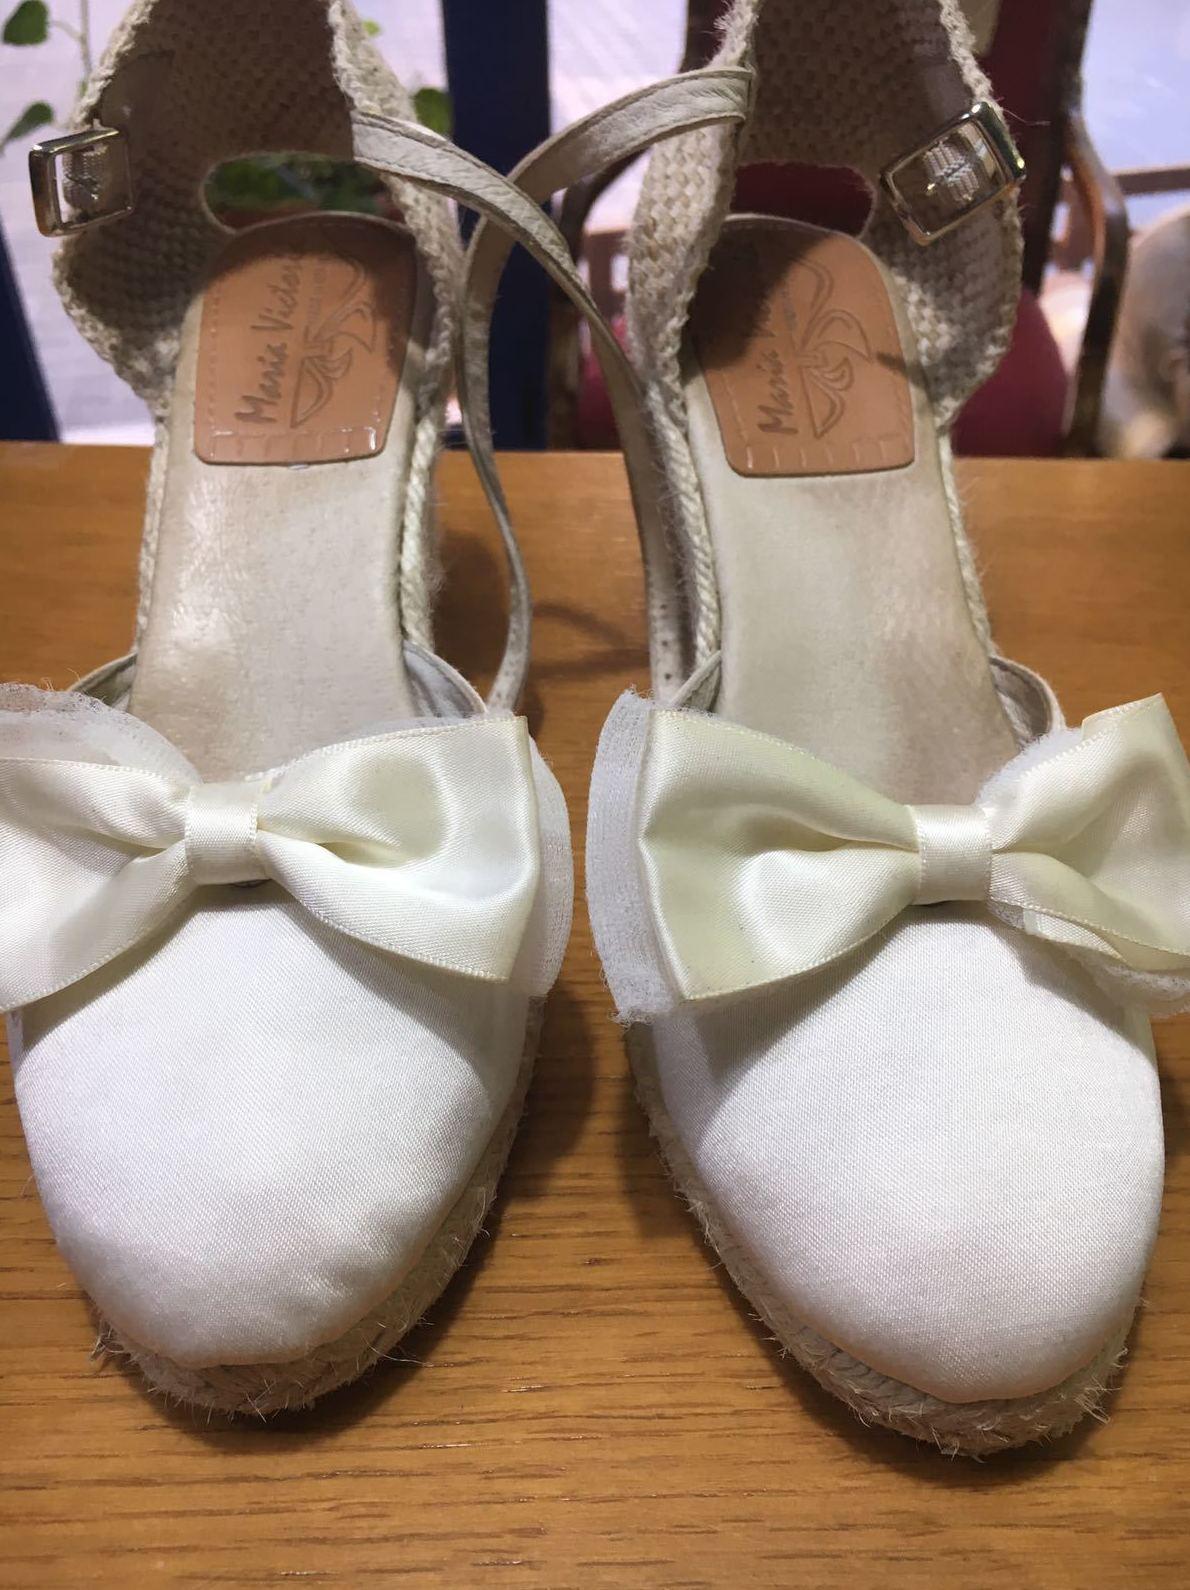 Limpieza de Zapatos: Servicios  of Tintorería Anubis